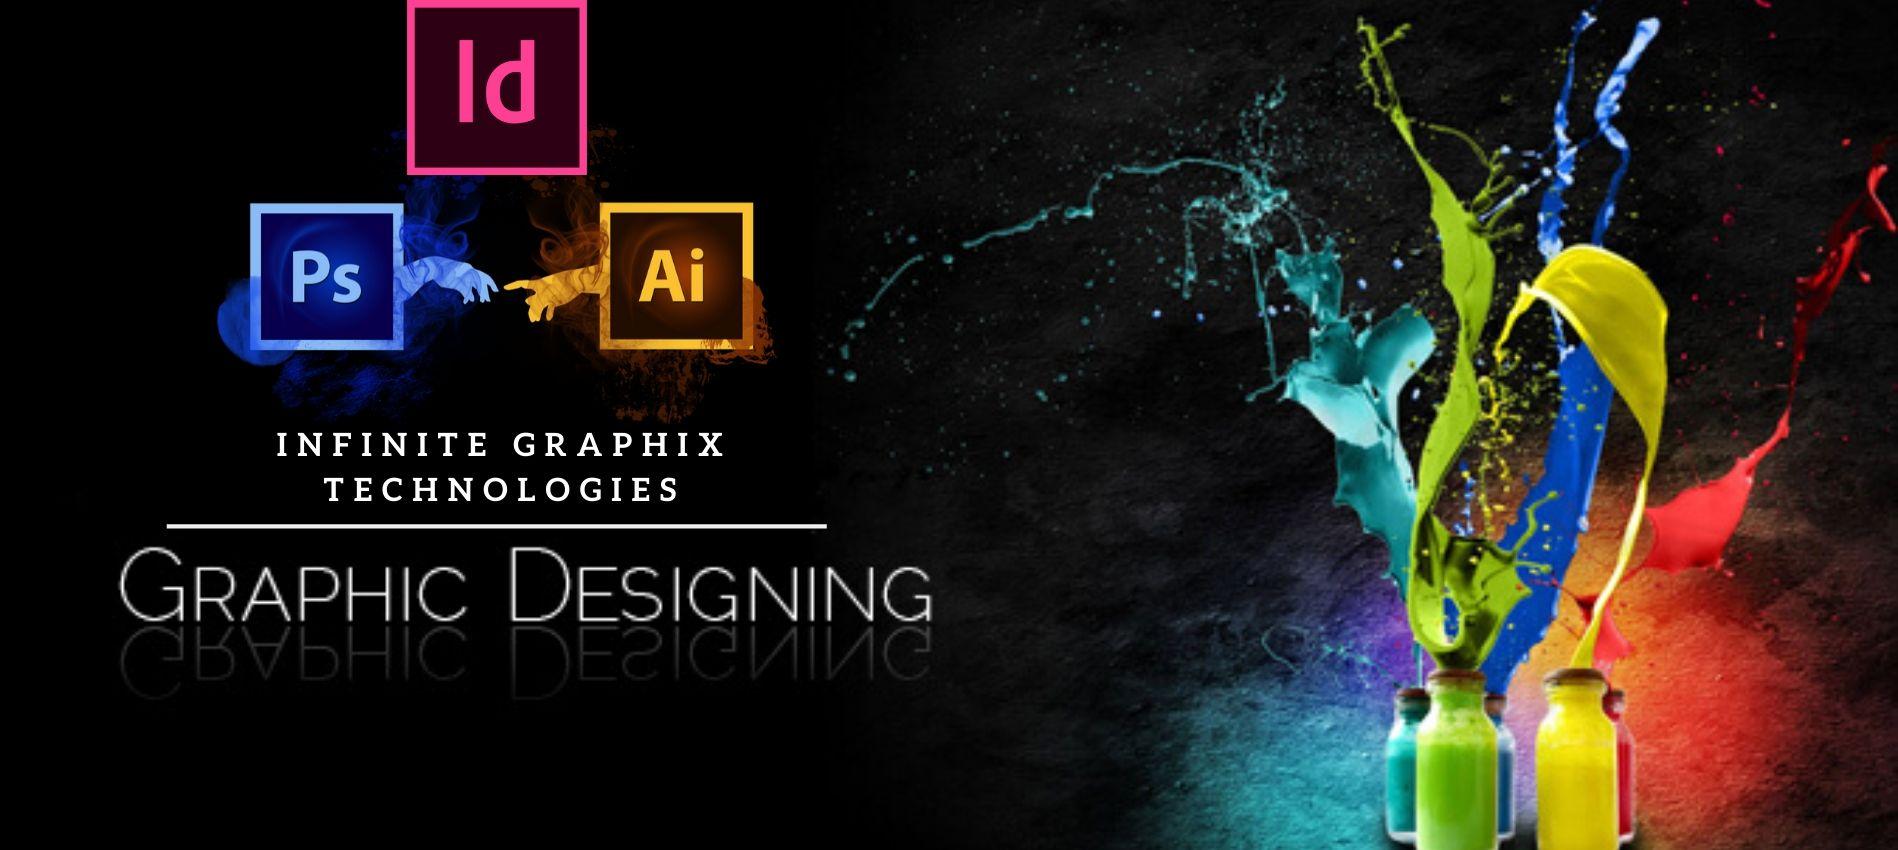 graphics designing course